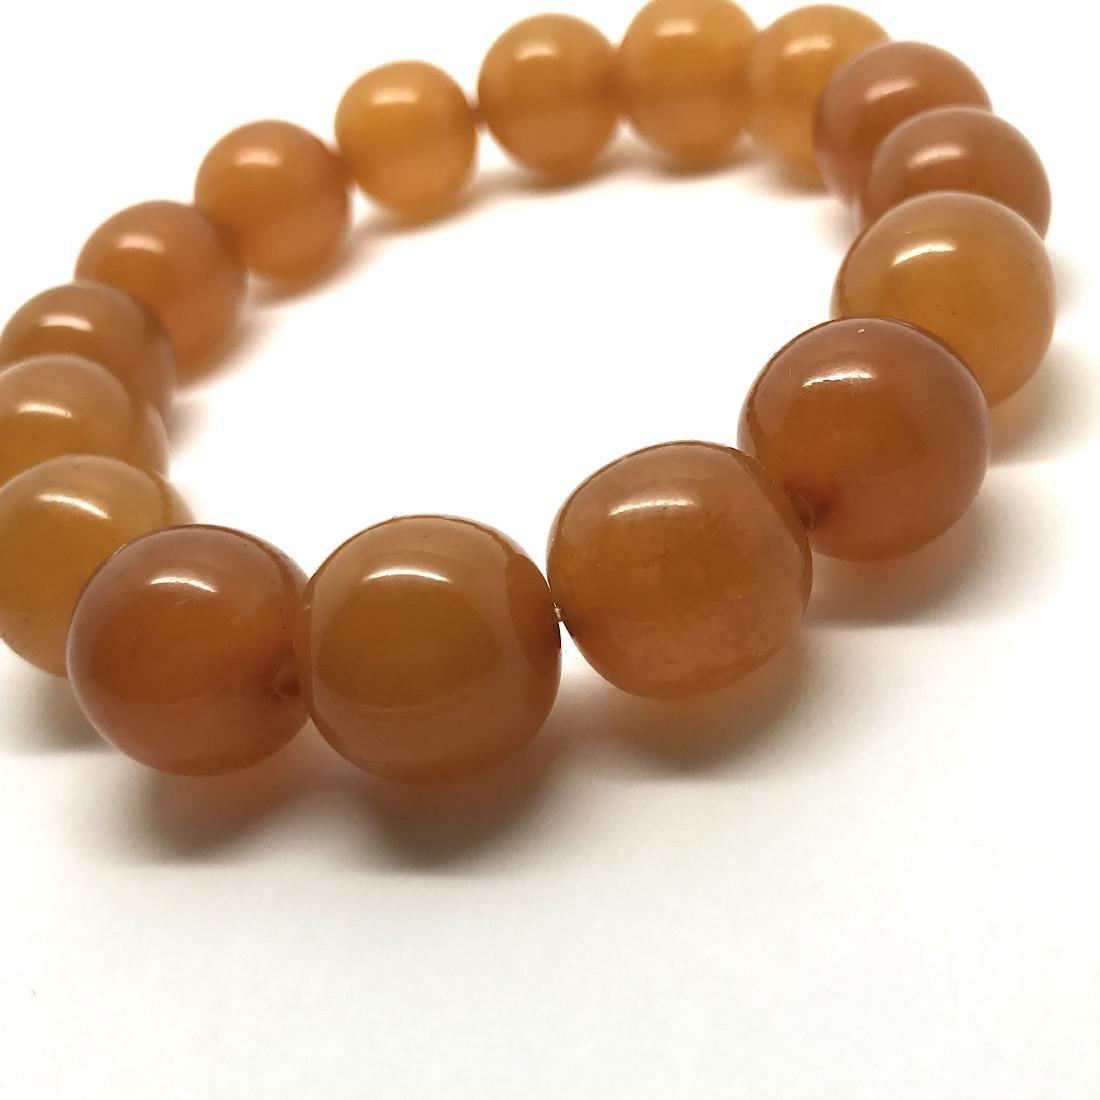 Antique Baltic amber beads bracelet 21.5 gr - 4